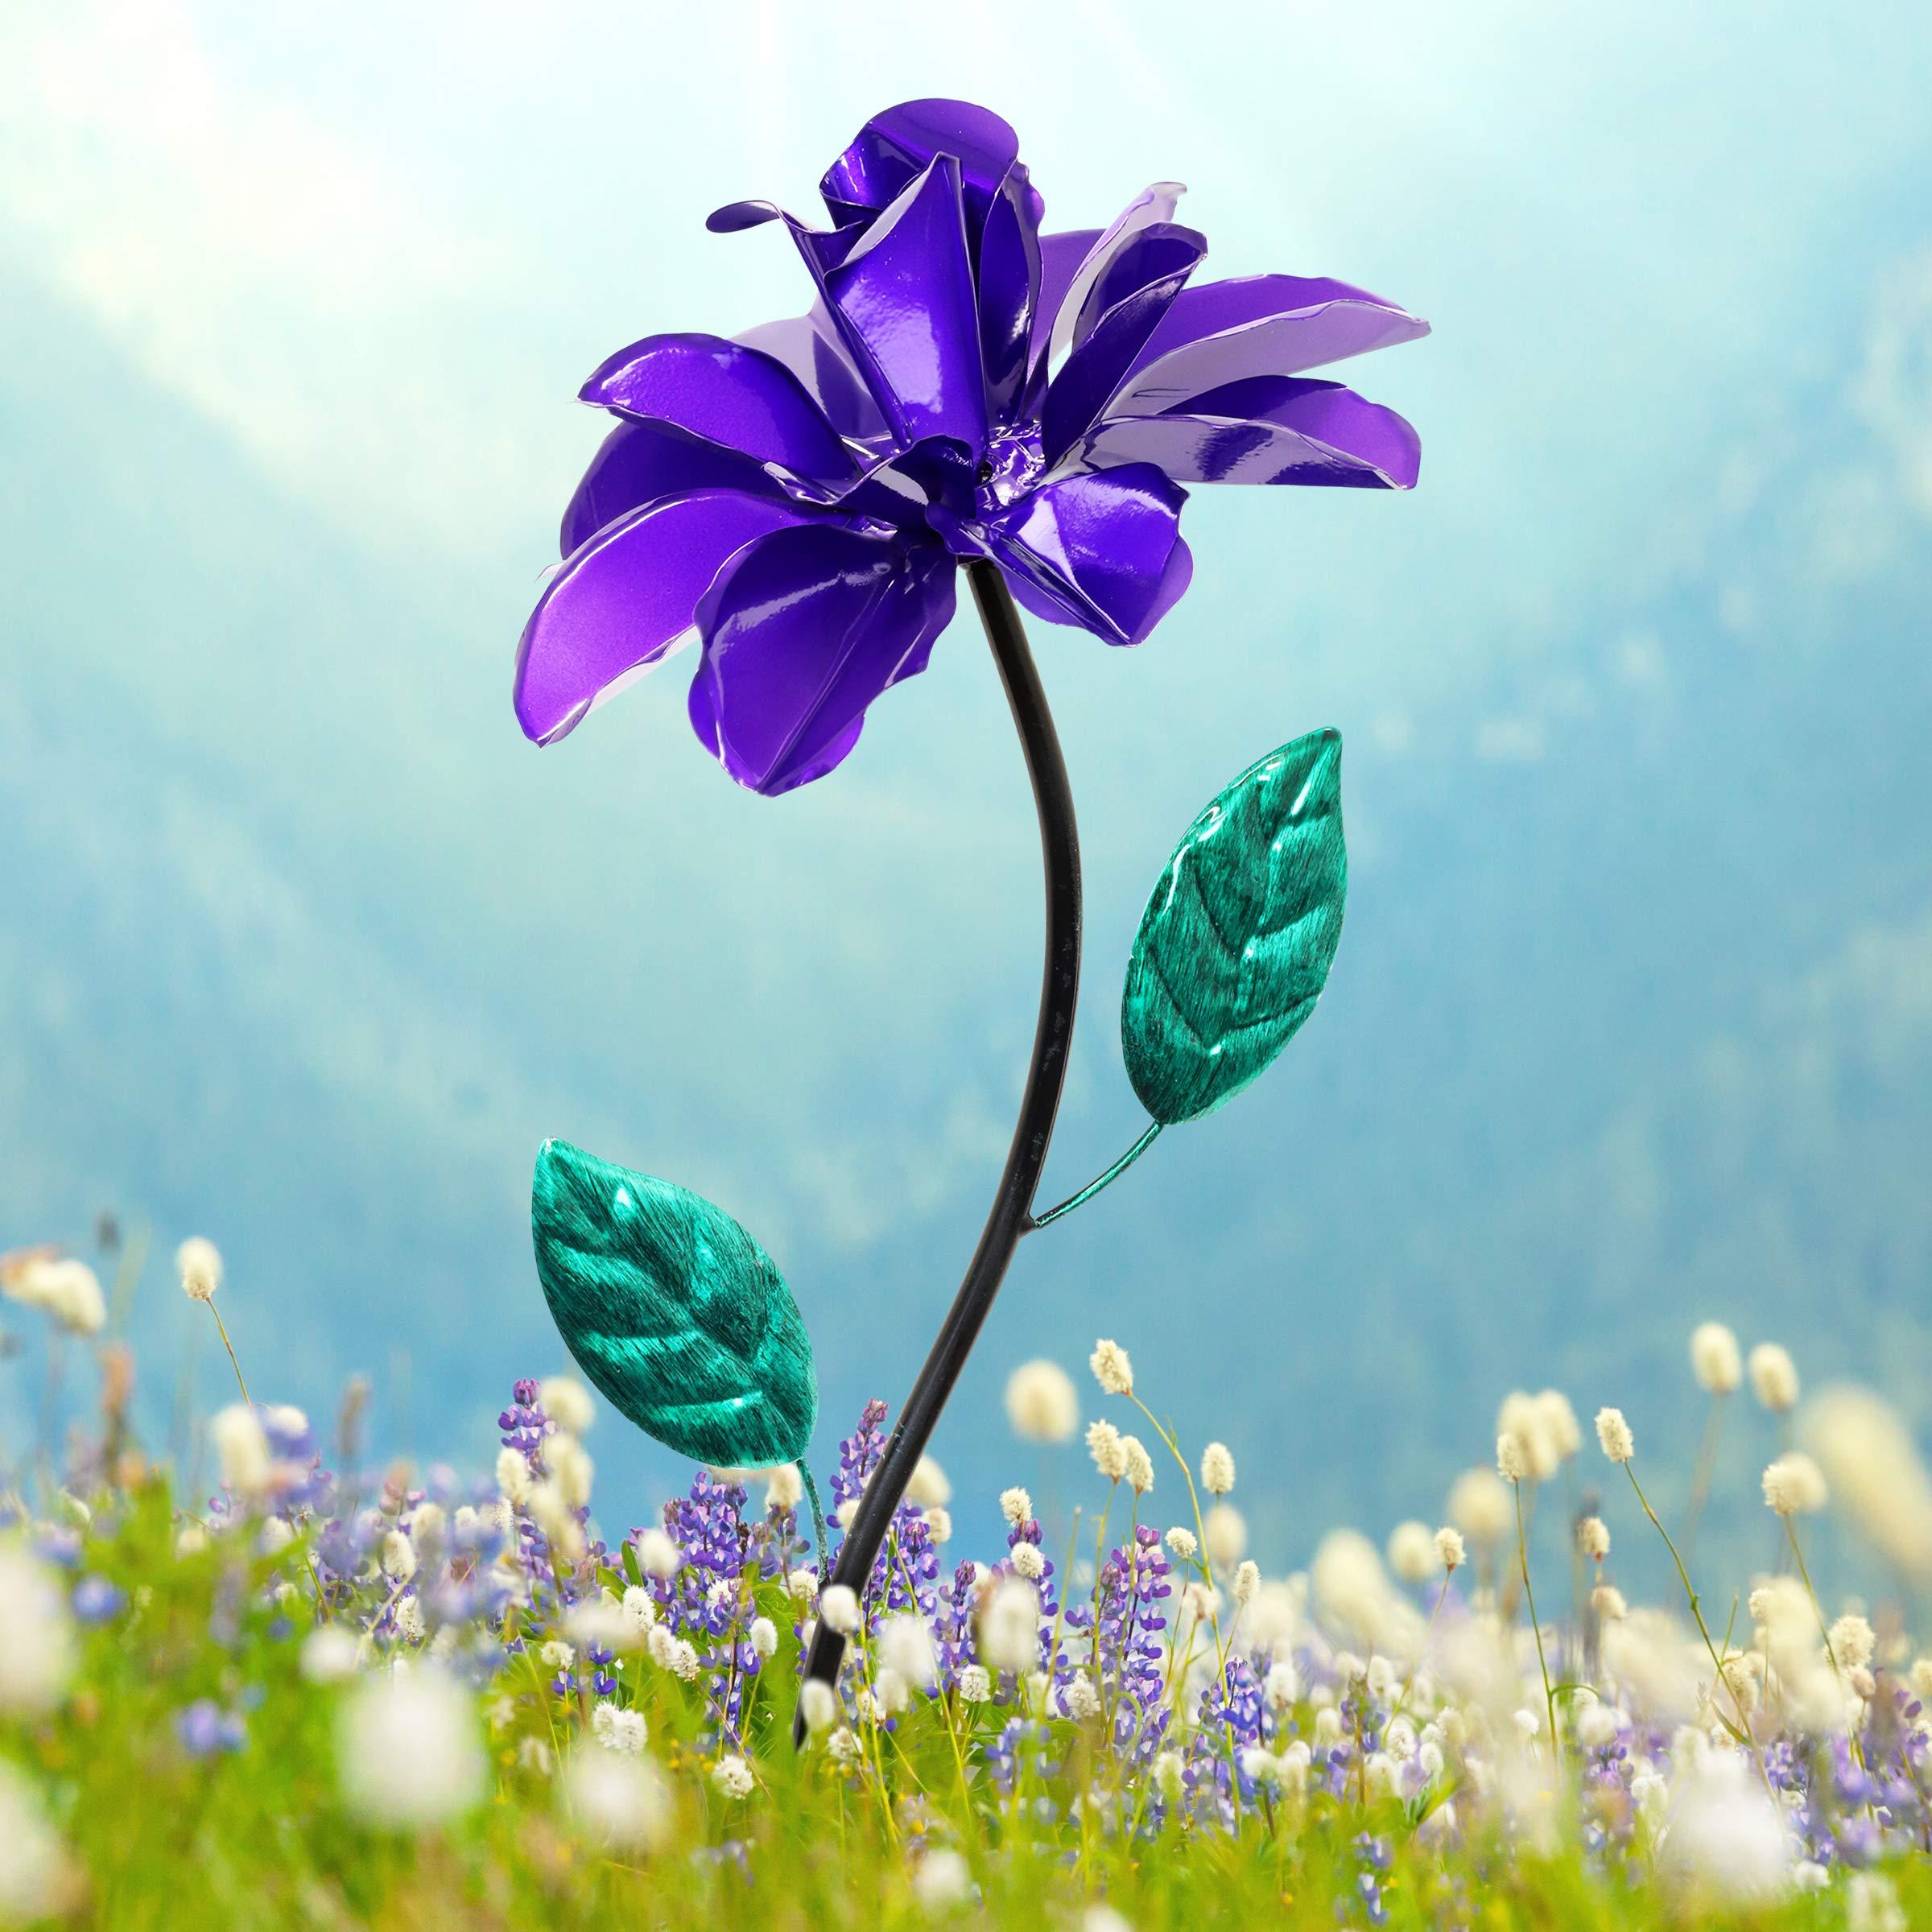 Exhart Purple Rose Wind Spinner Garden Stake - Single Rose Flower Spinner Hand Painted in Metallic Purple